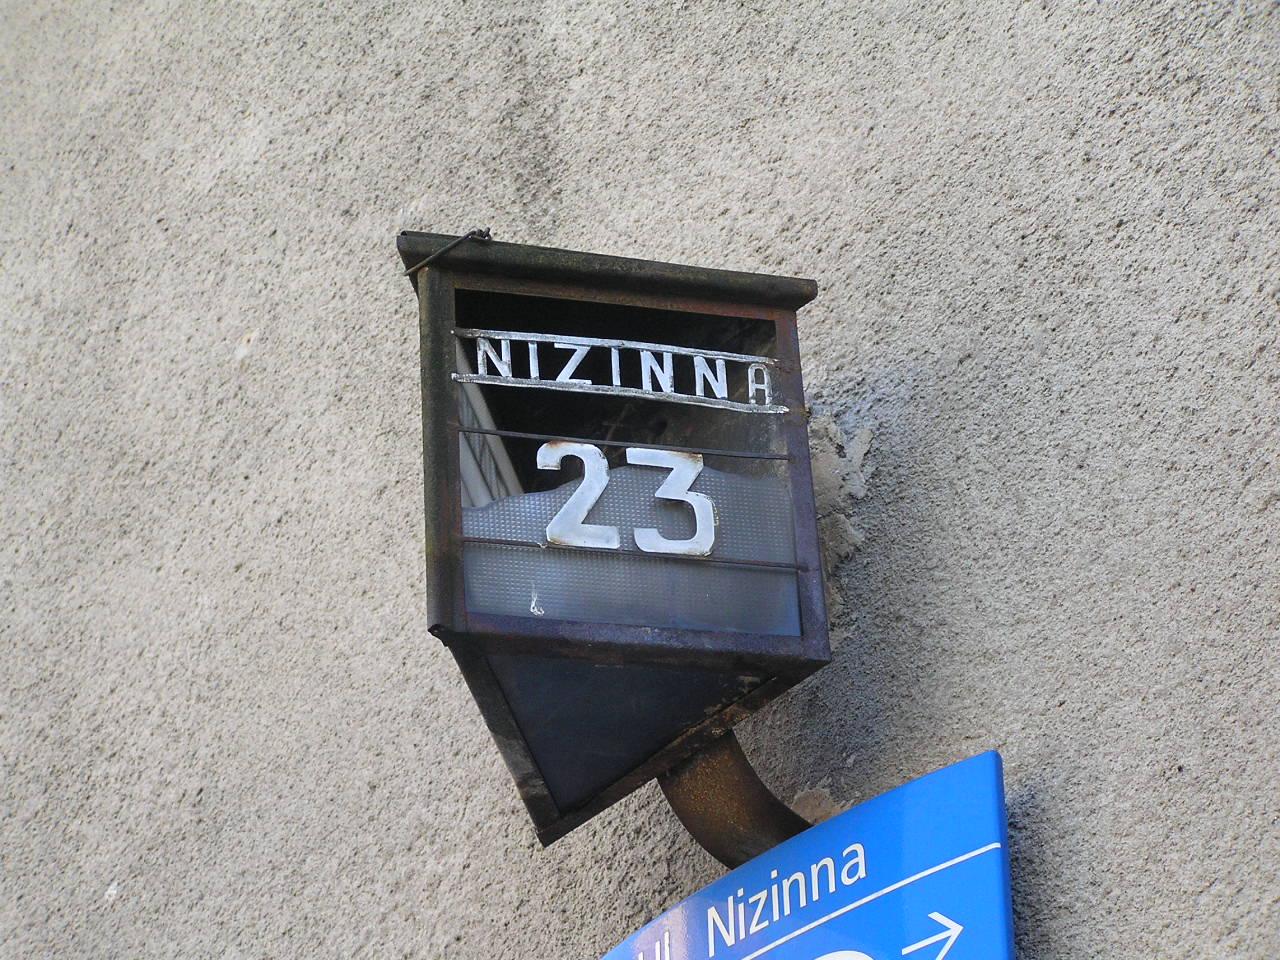 Latarenka adresowa - Nizinna 23